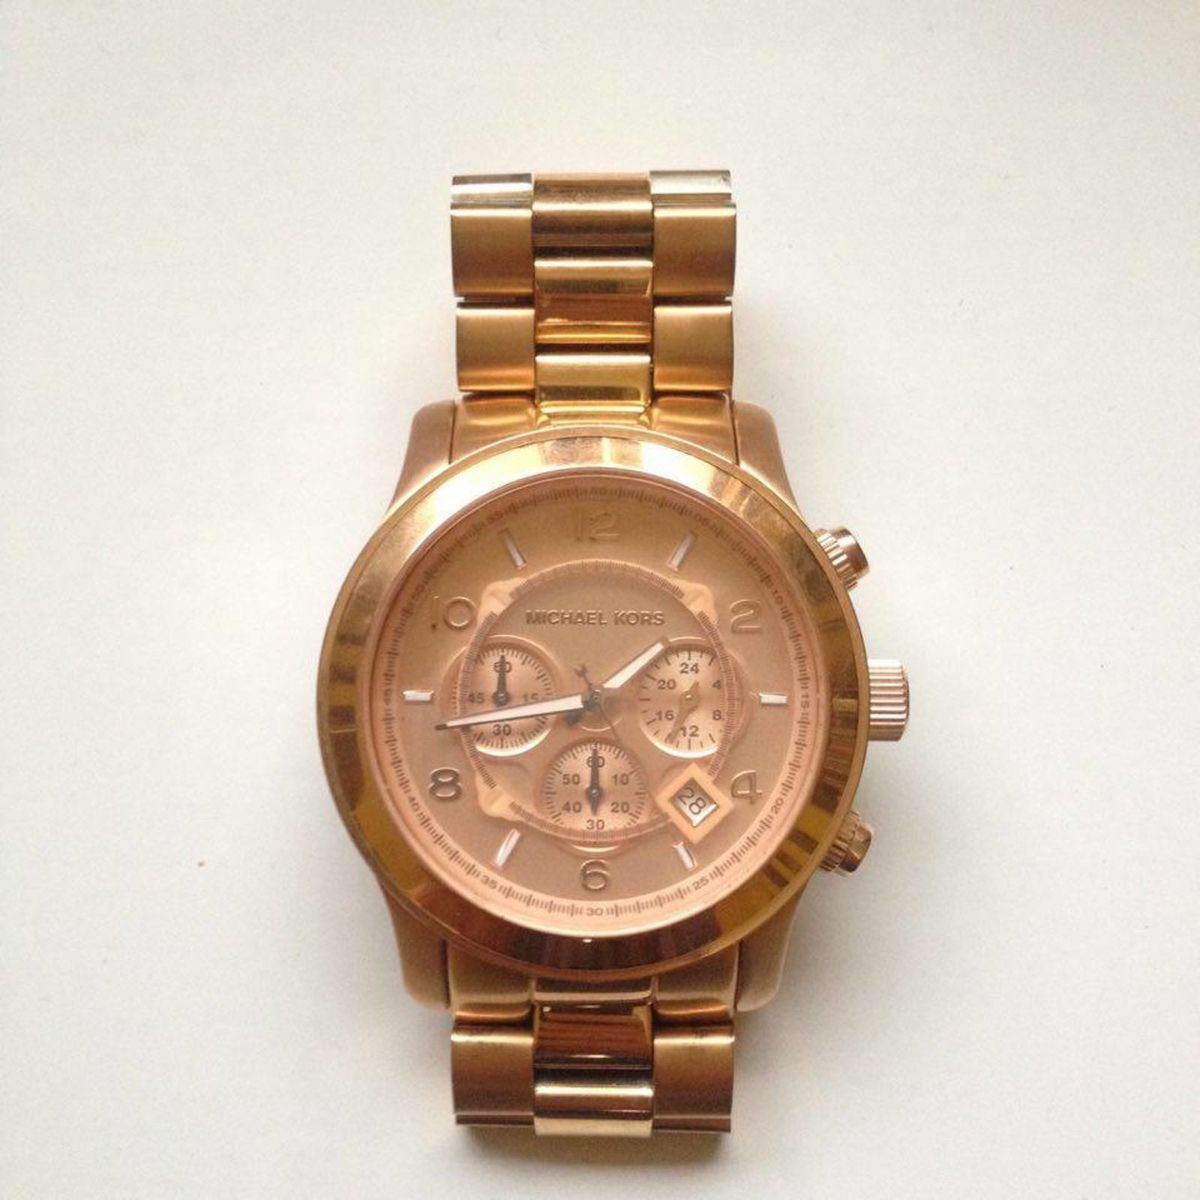 47c9e14e9 Relógio Michael Kors Mk 8086 | Relógio Feminino Michael Kors Usado 21015040  | enjoei